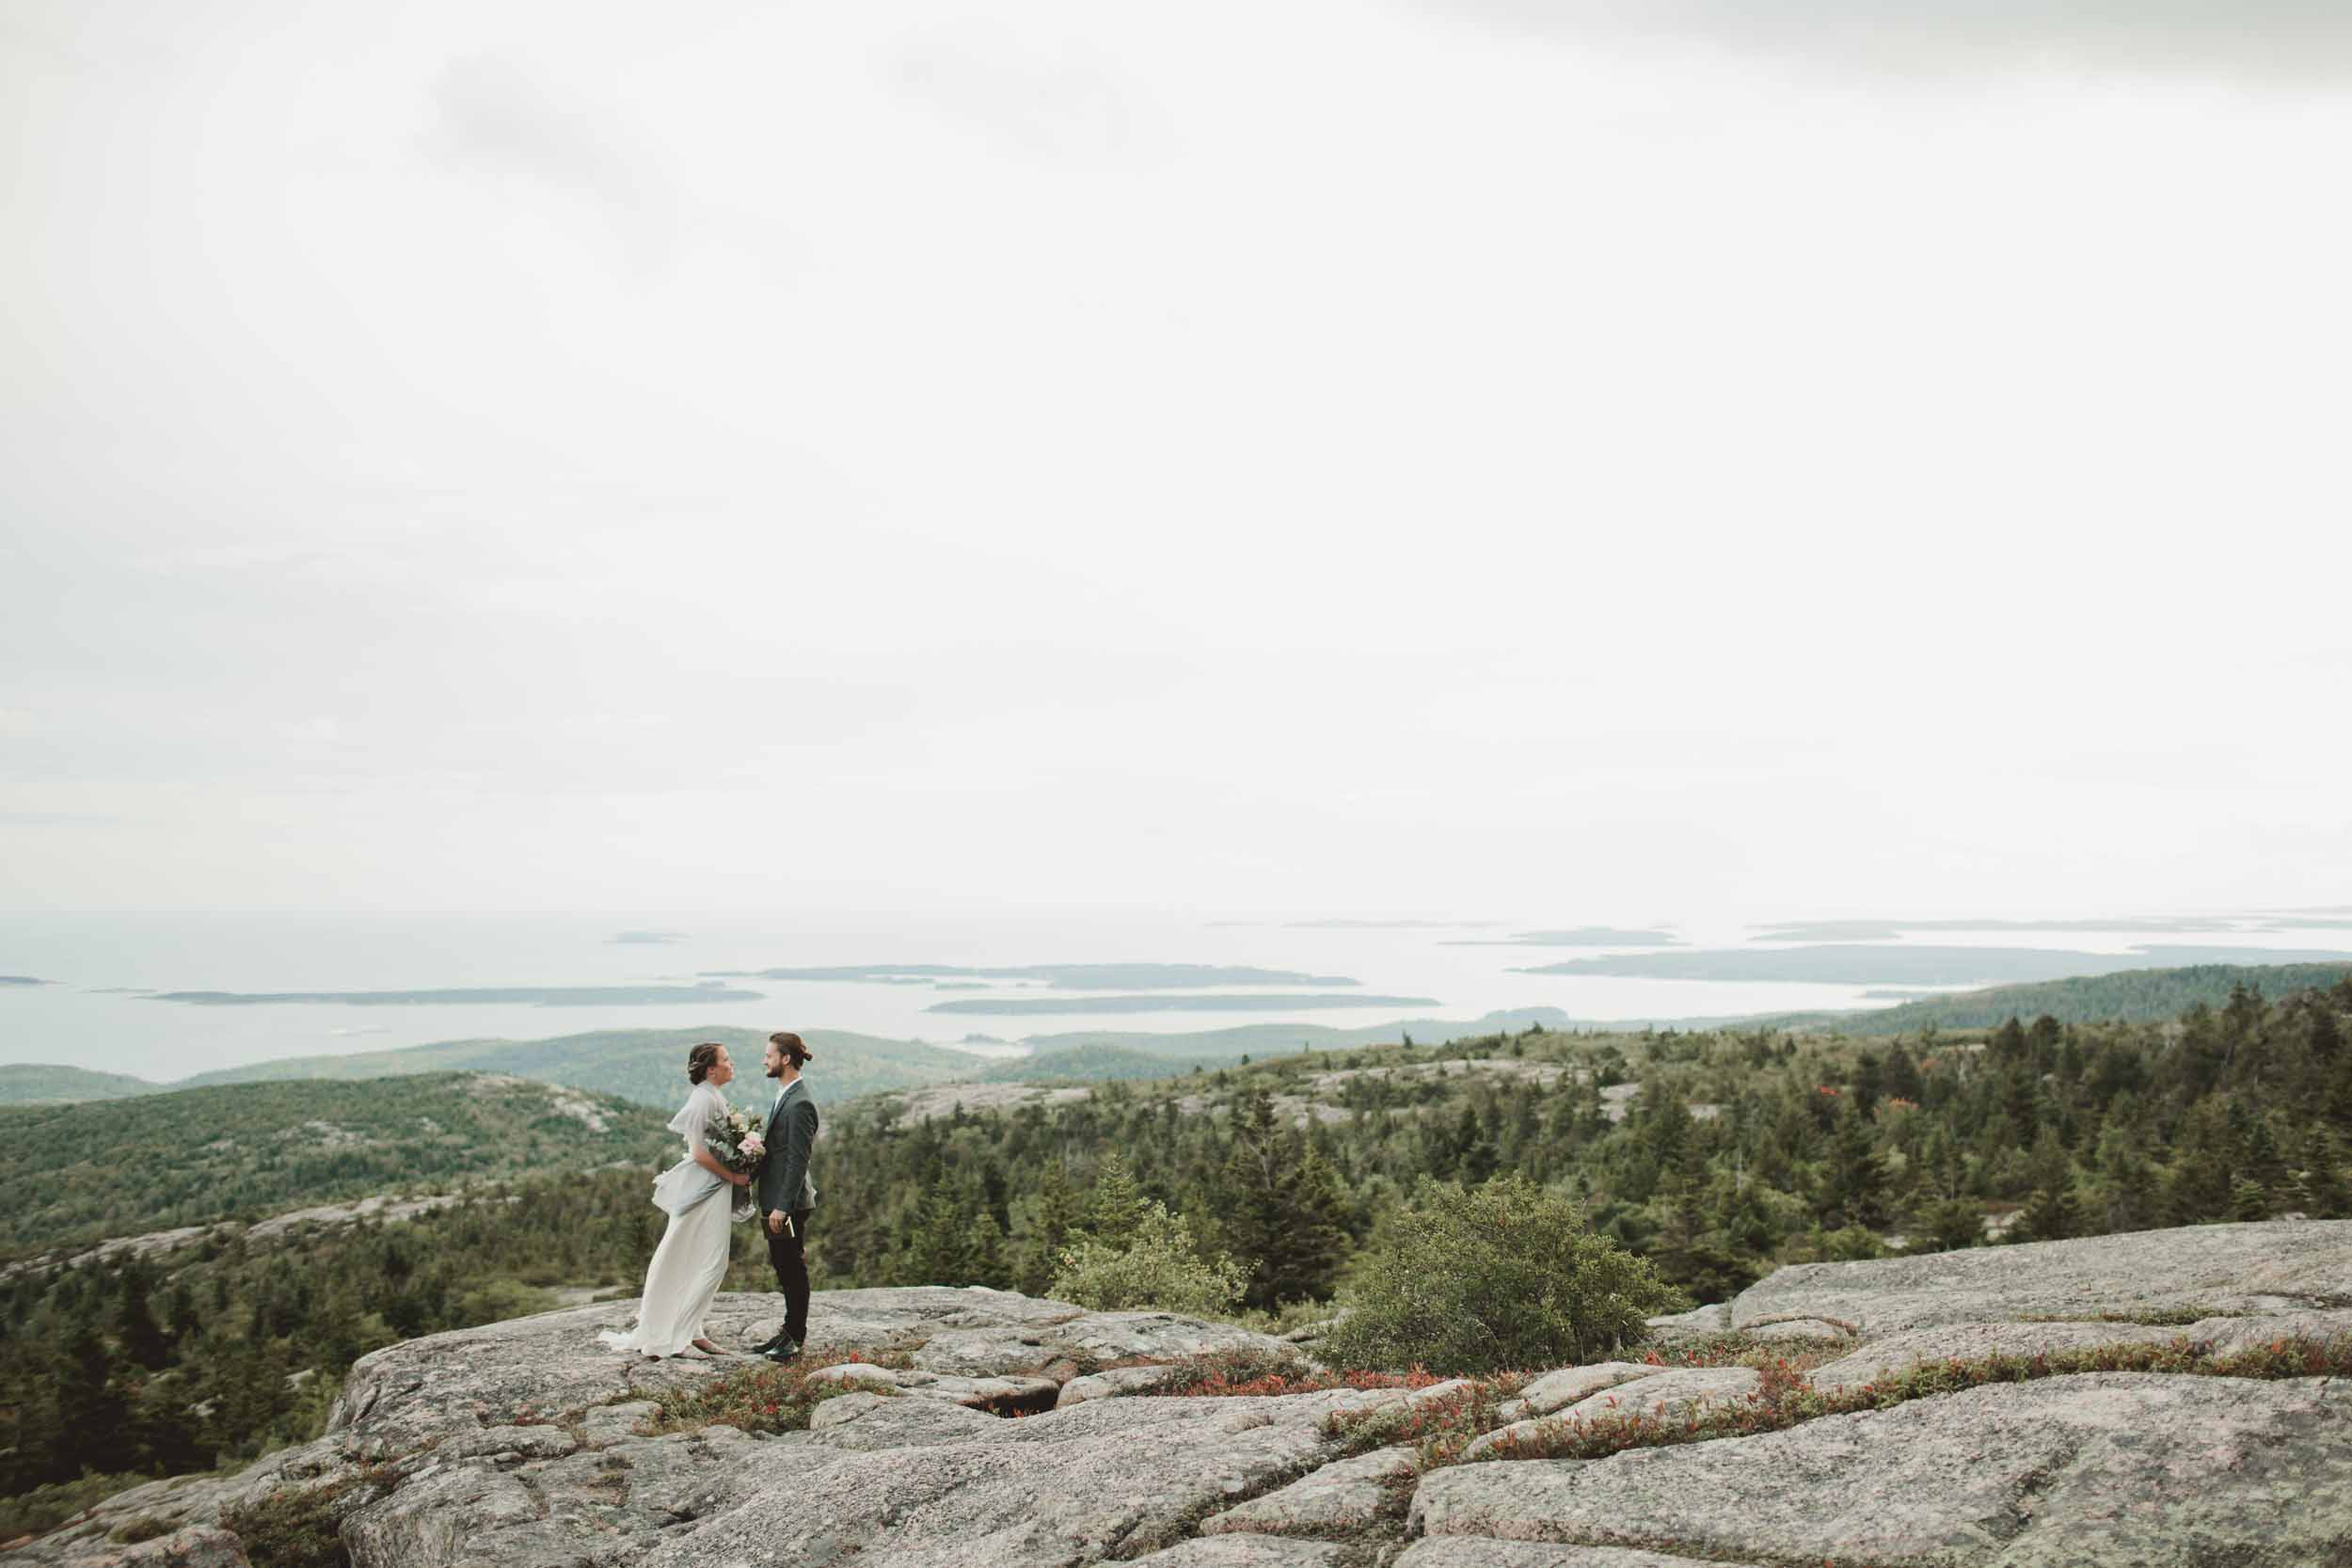 Maine-Elopement-Photographer91.jpg